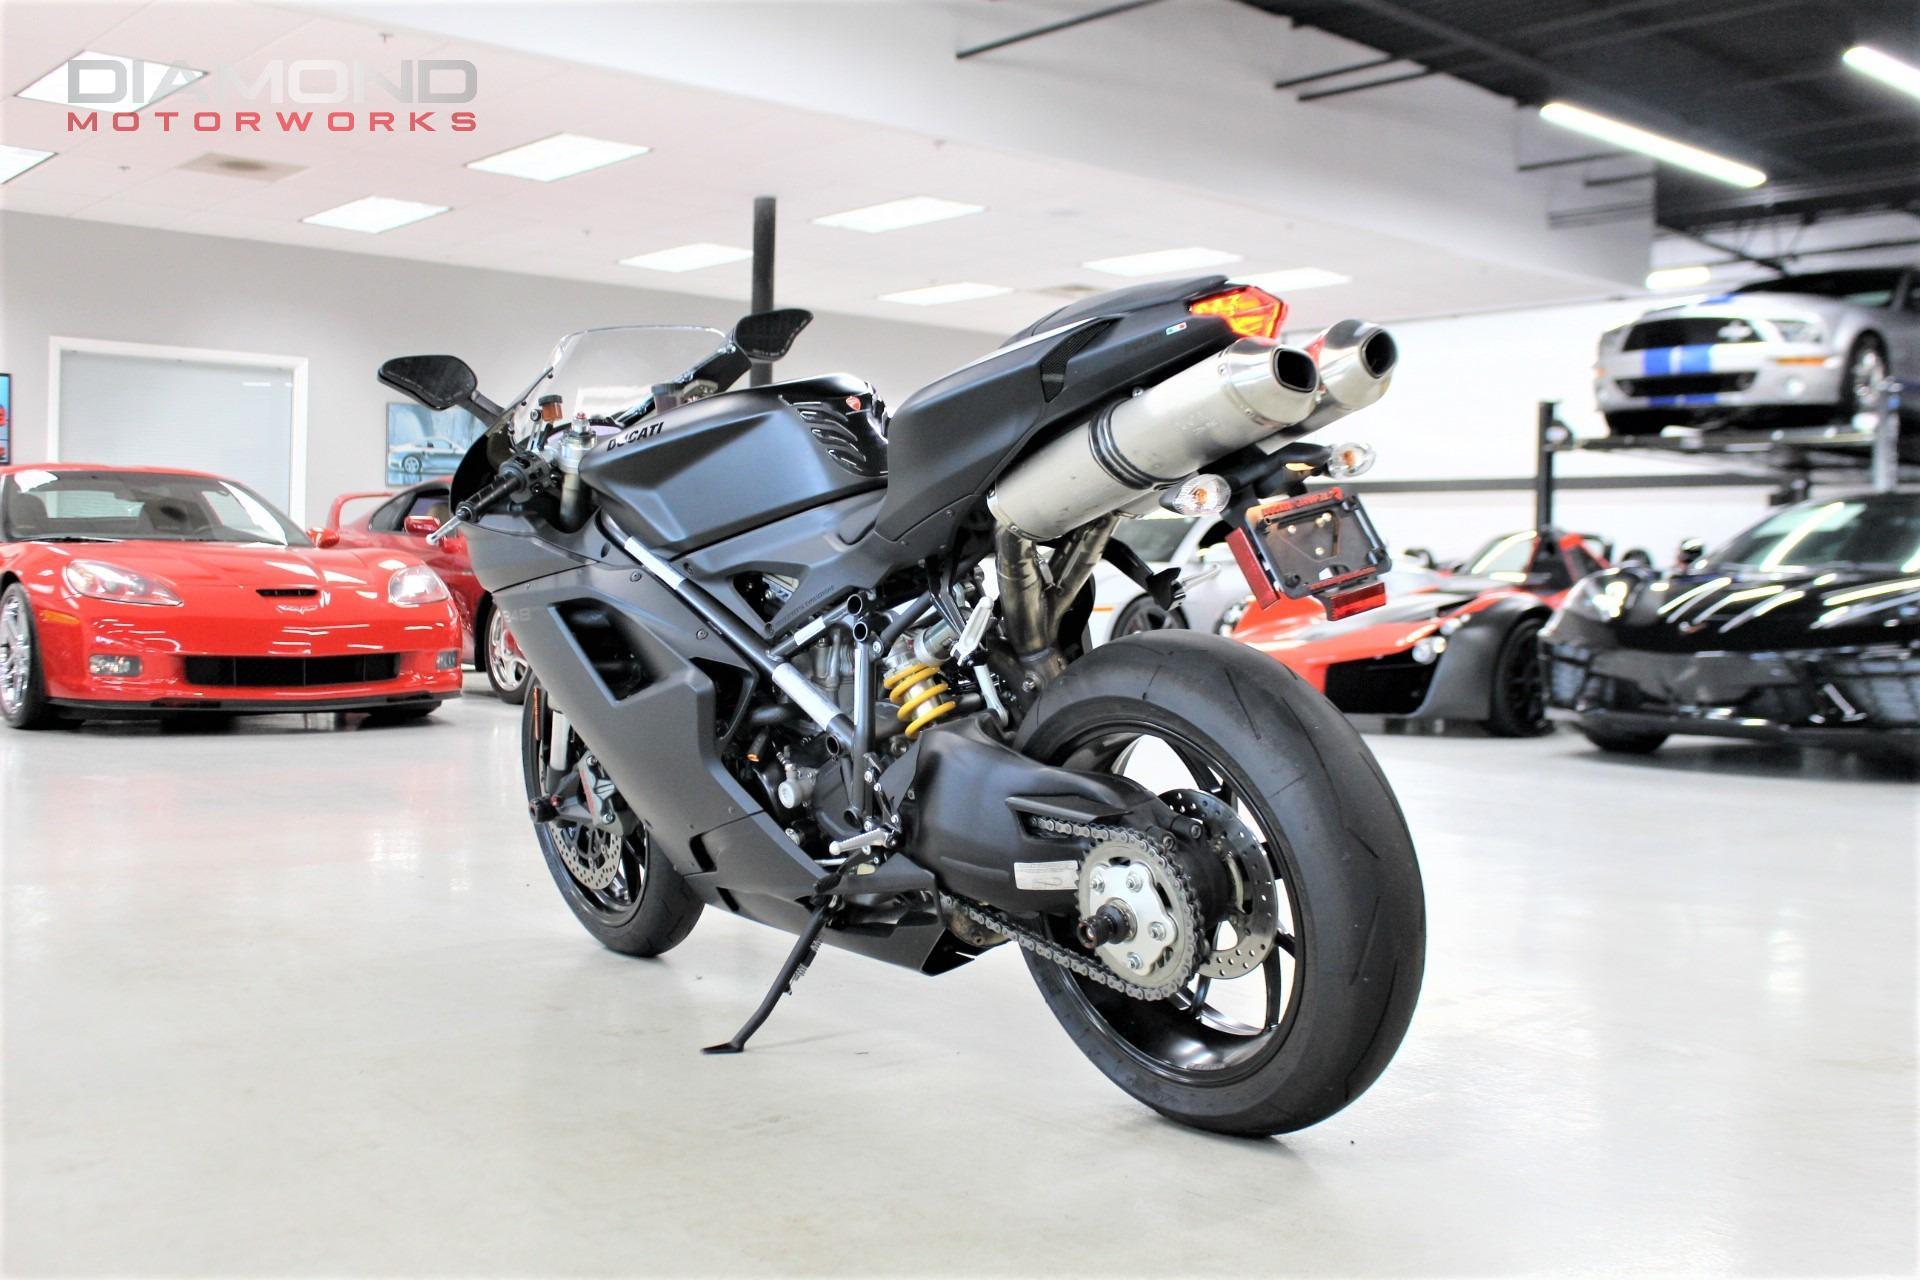 Used-2013-Ducati-848-EVO